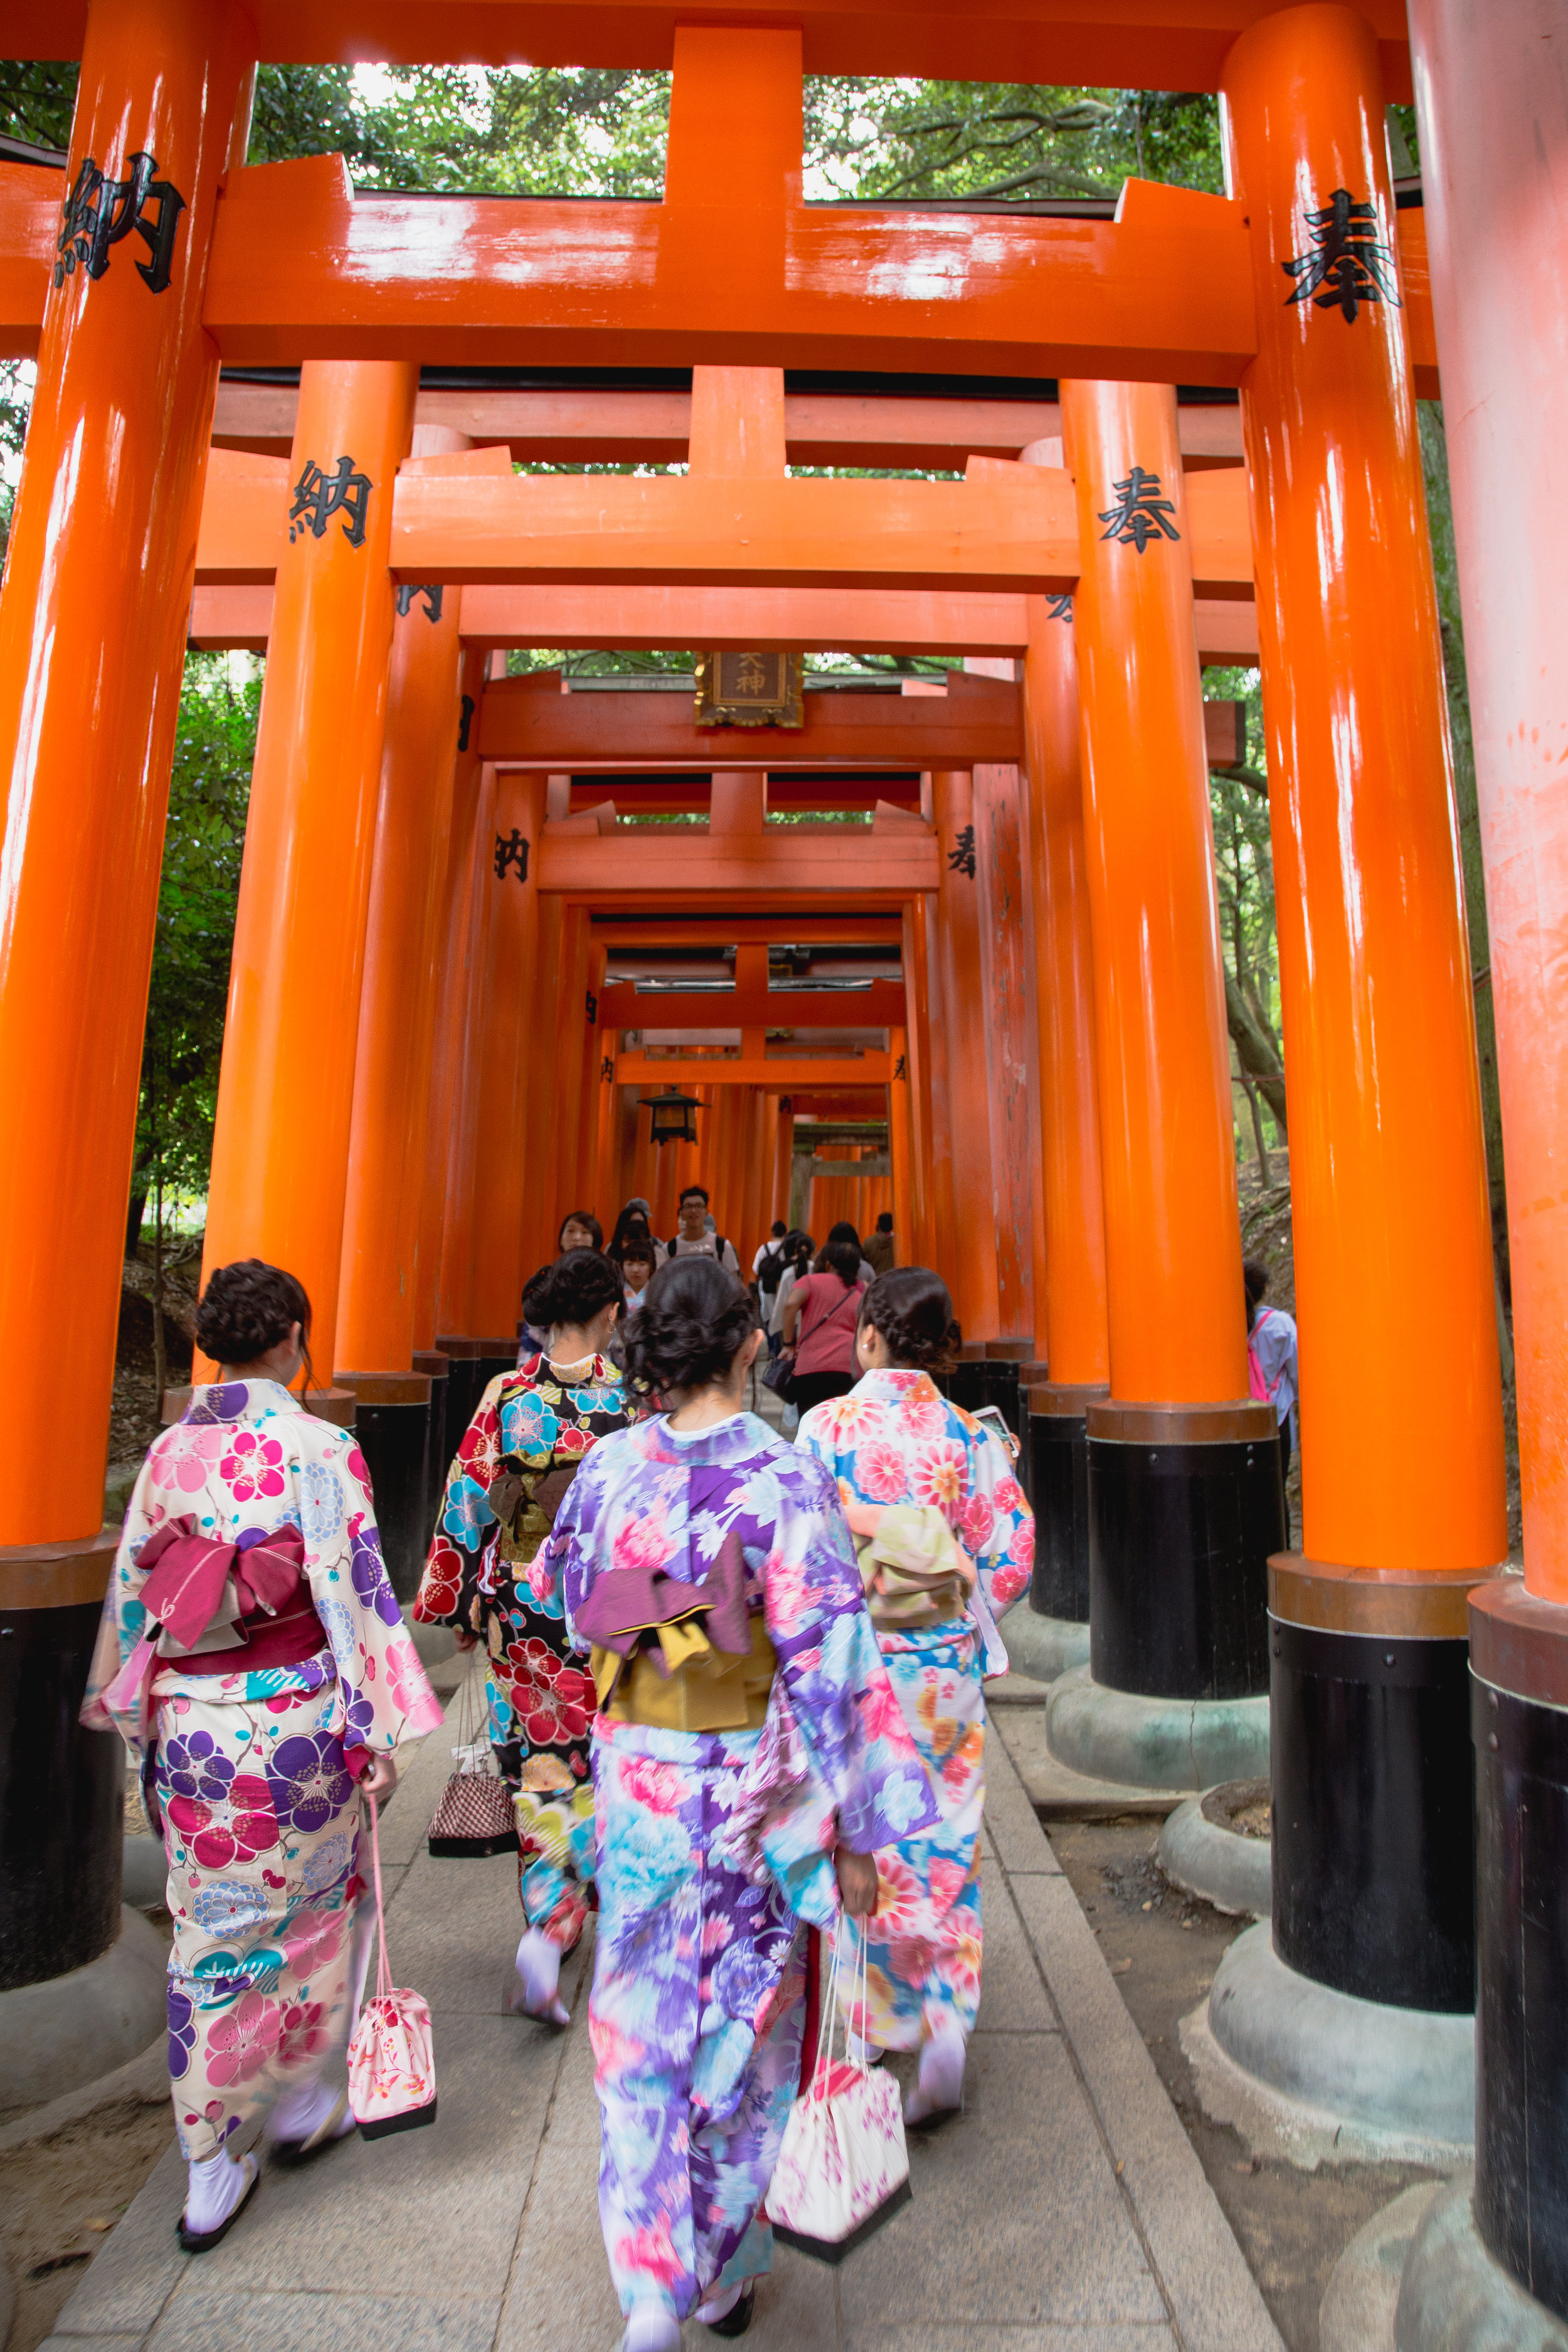 Kimono-clad at Fushimi Inari-taisha